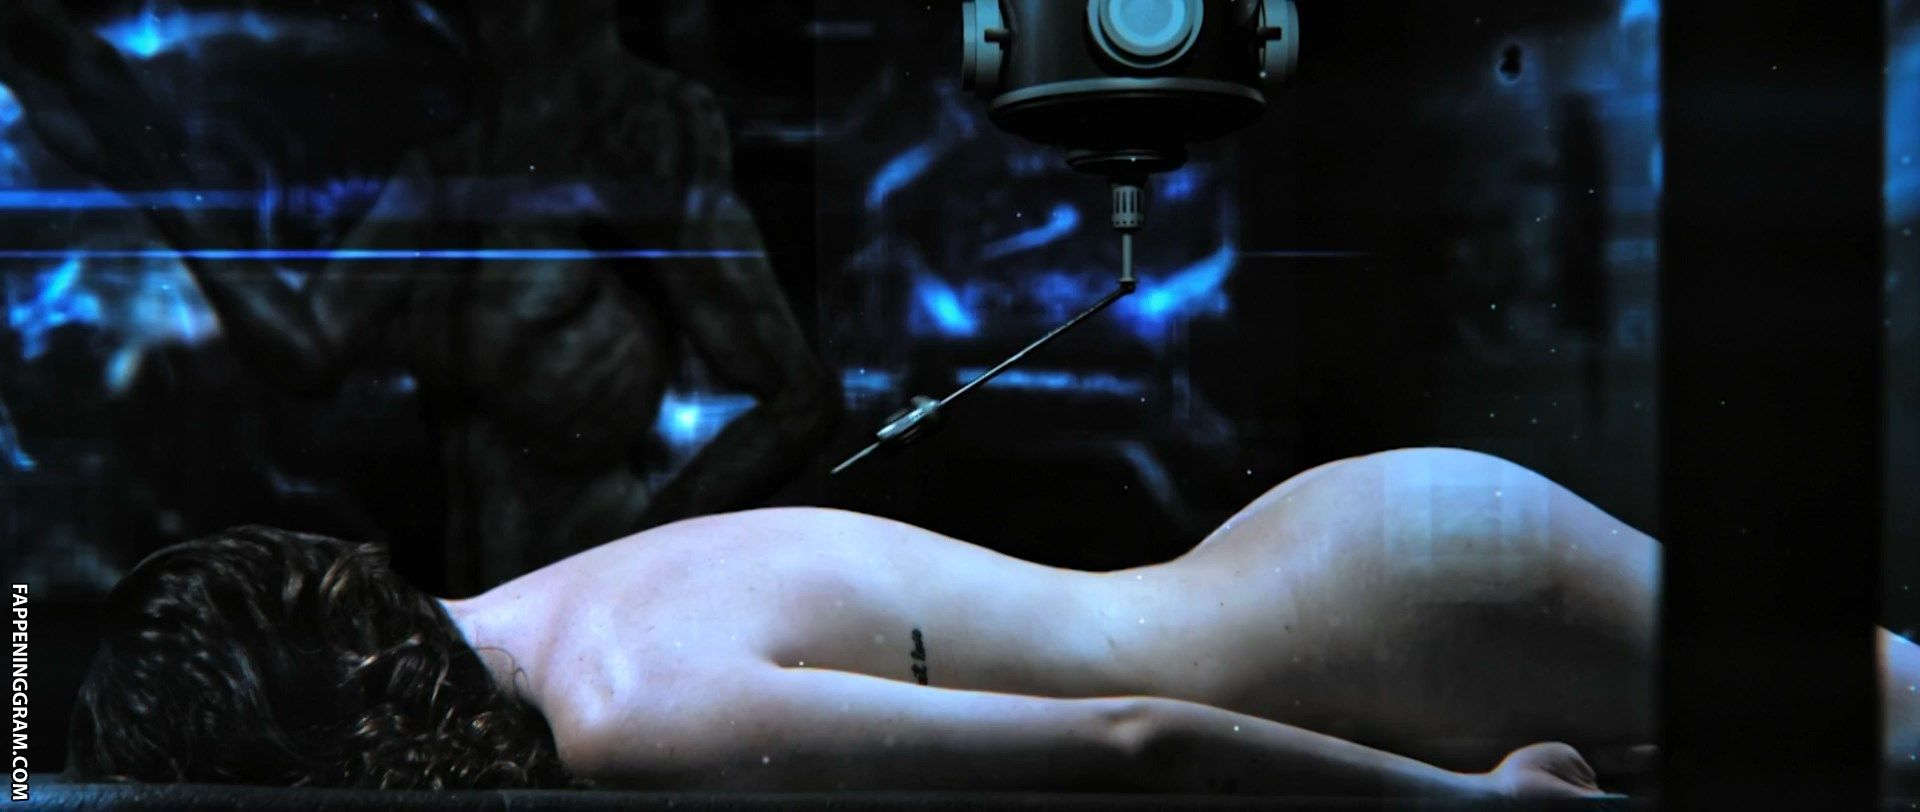 Alys crocker nude pics pics, sex tape ancensored